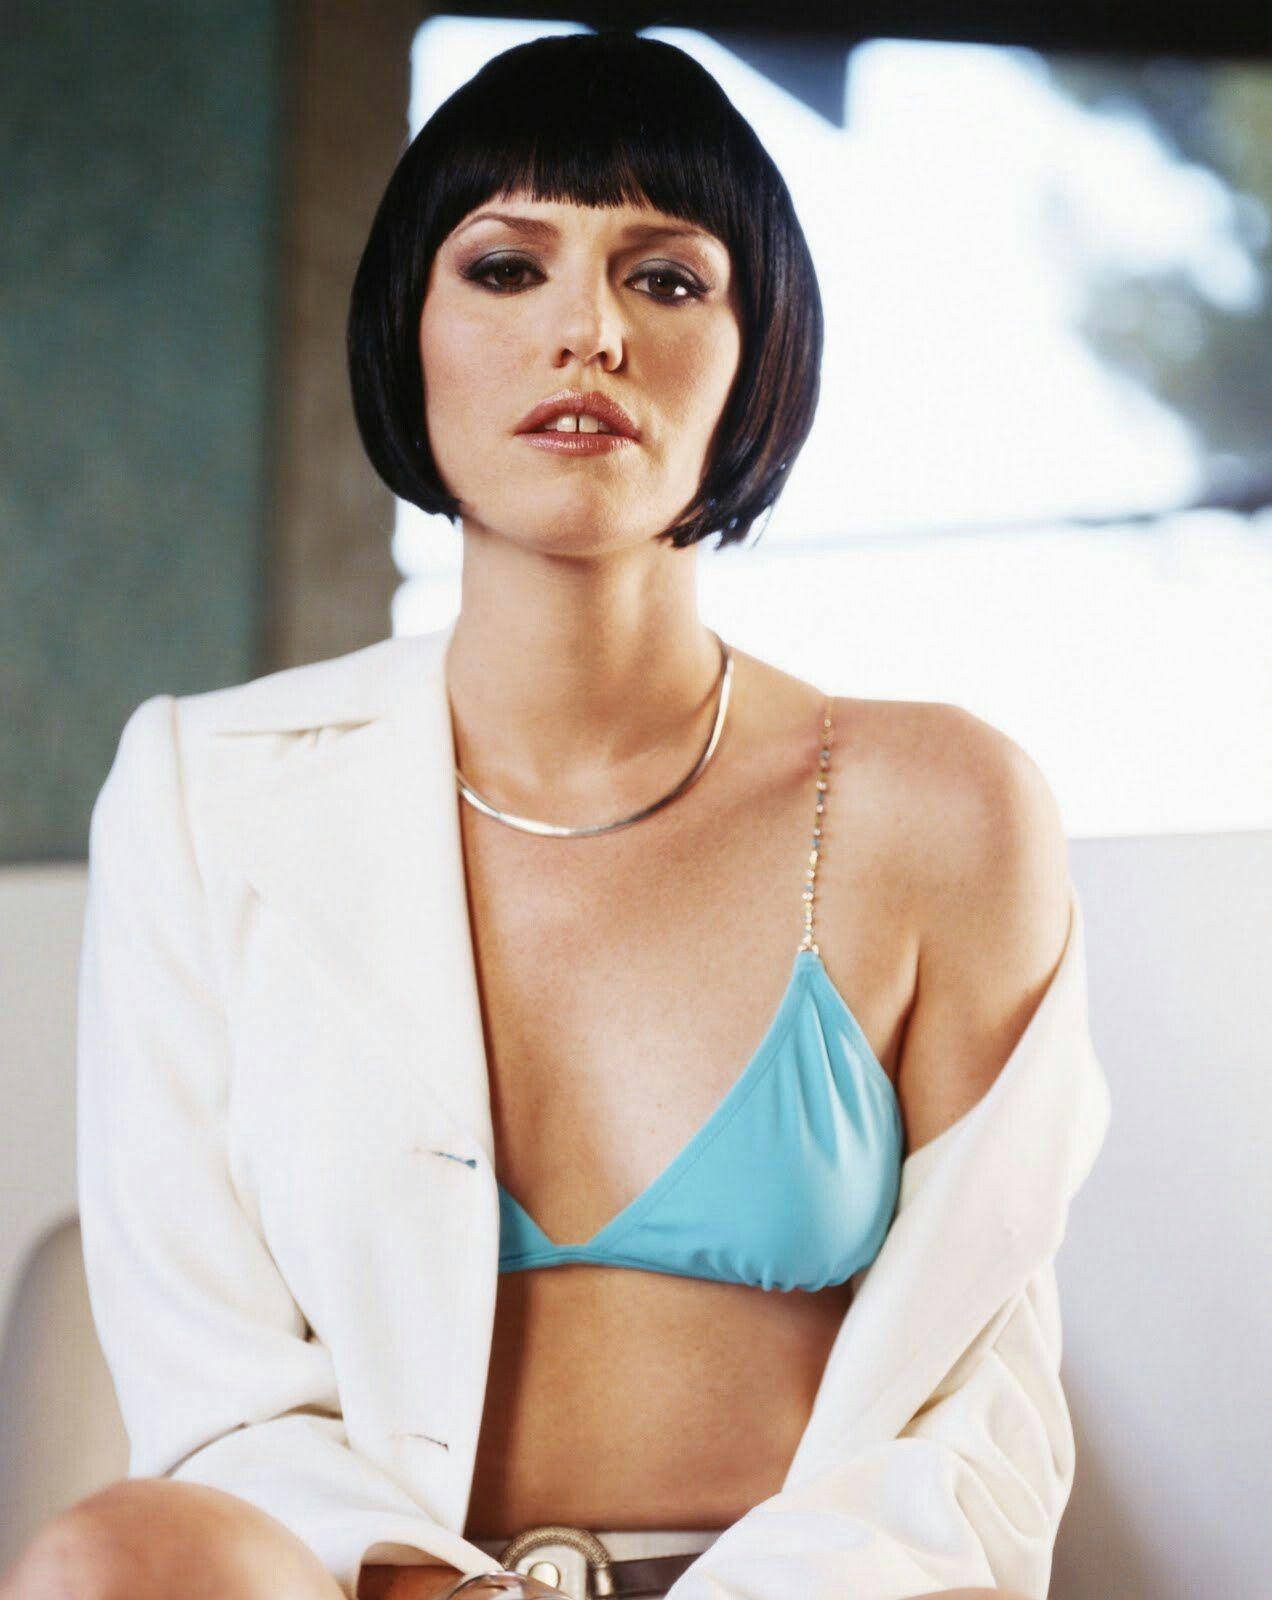 Pin By Johannes 65 On Csi Csi Las Vegas Favorite Celebrities Actresses